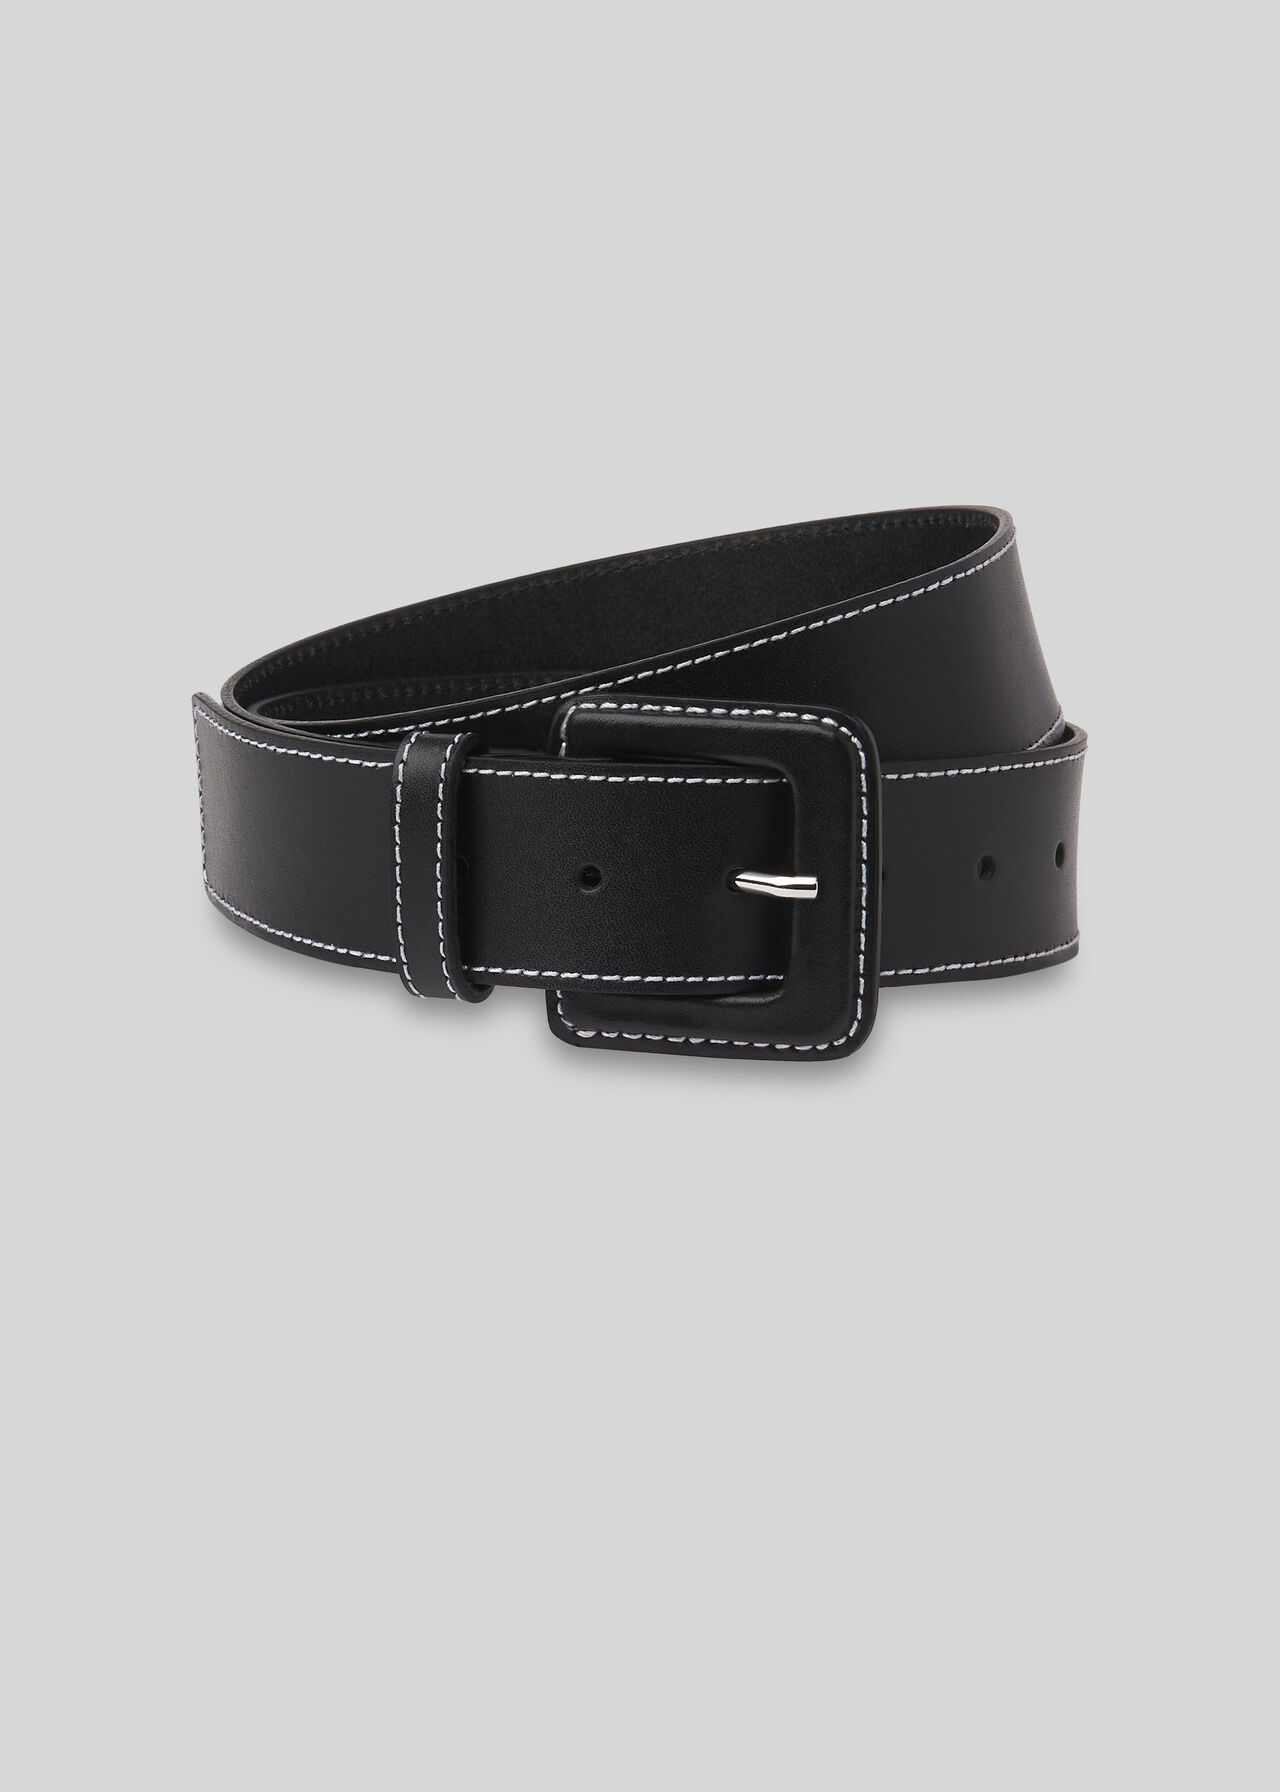 Contrast Stitch Belt Black